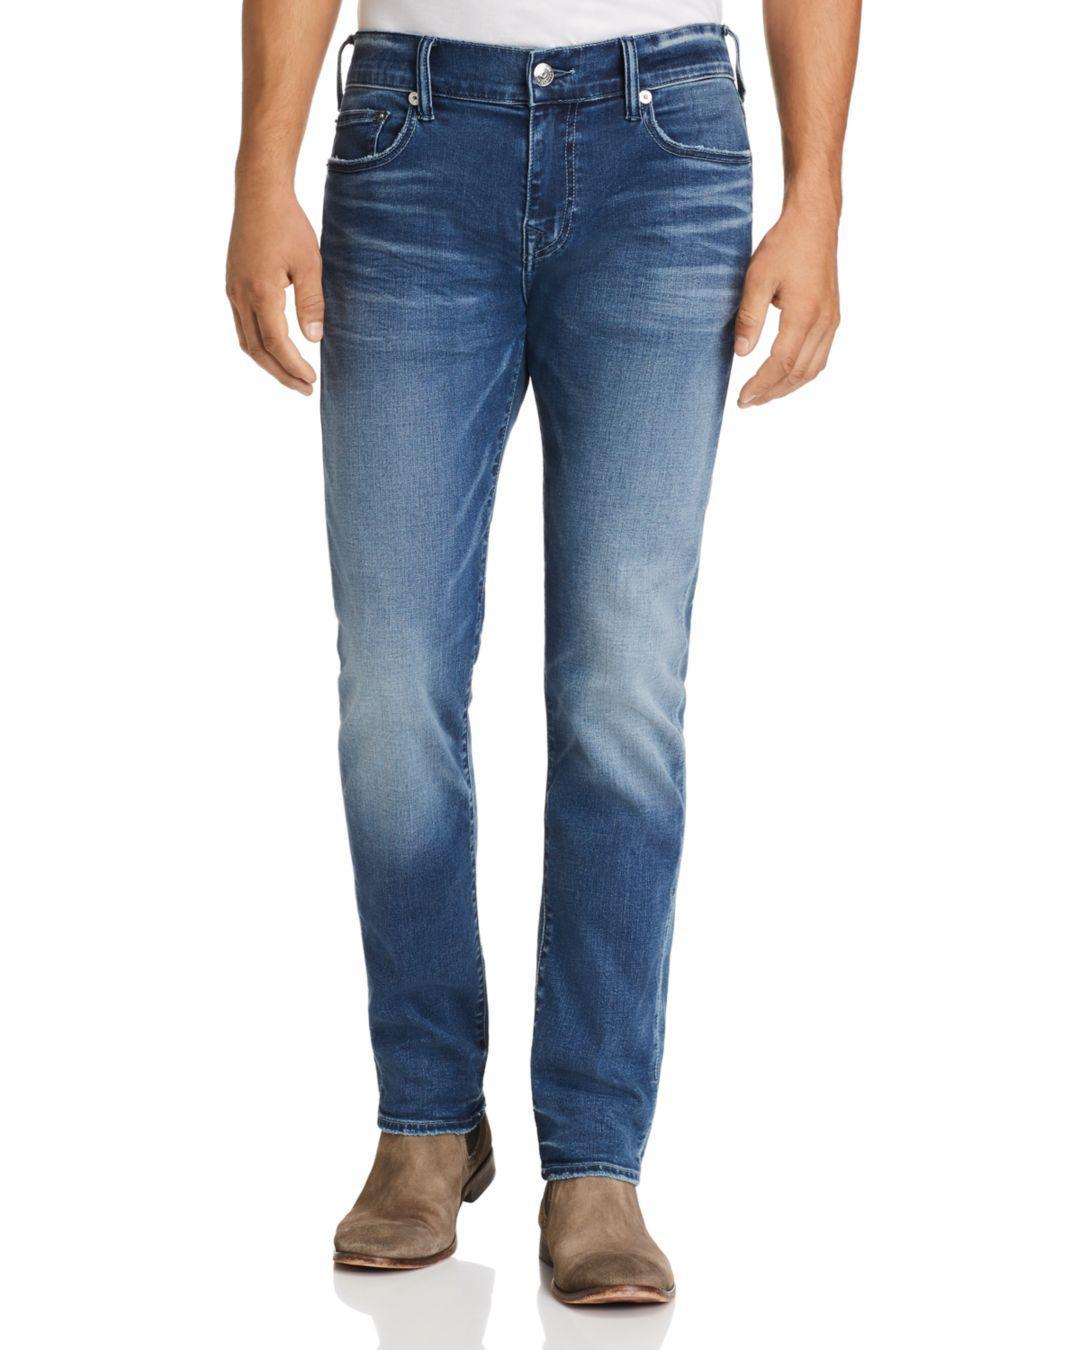 d5a84d77ba37 Lyst - True Religion Rocco Slim Fit Jeans In Baseline in Blue for Men